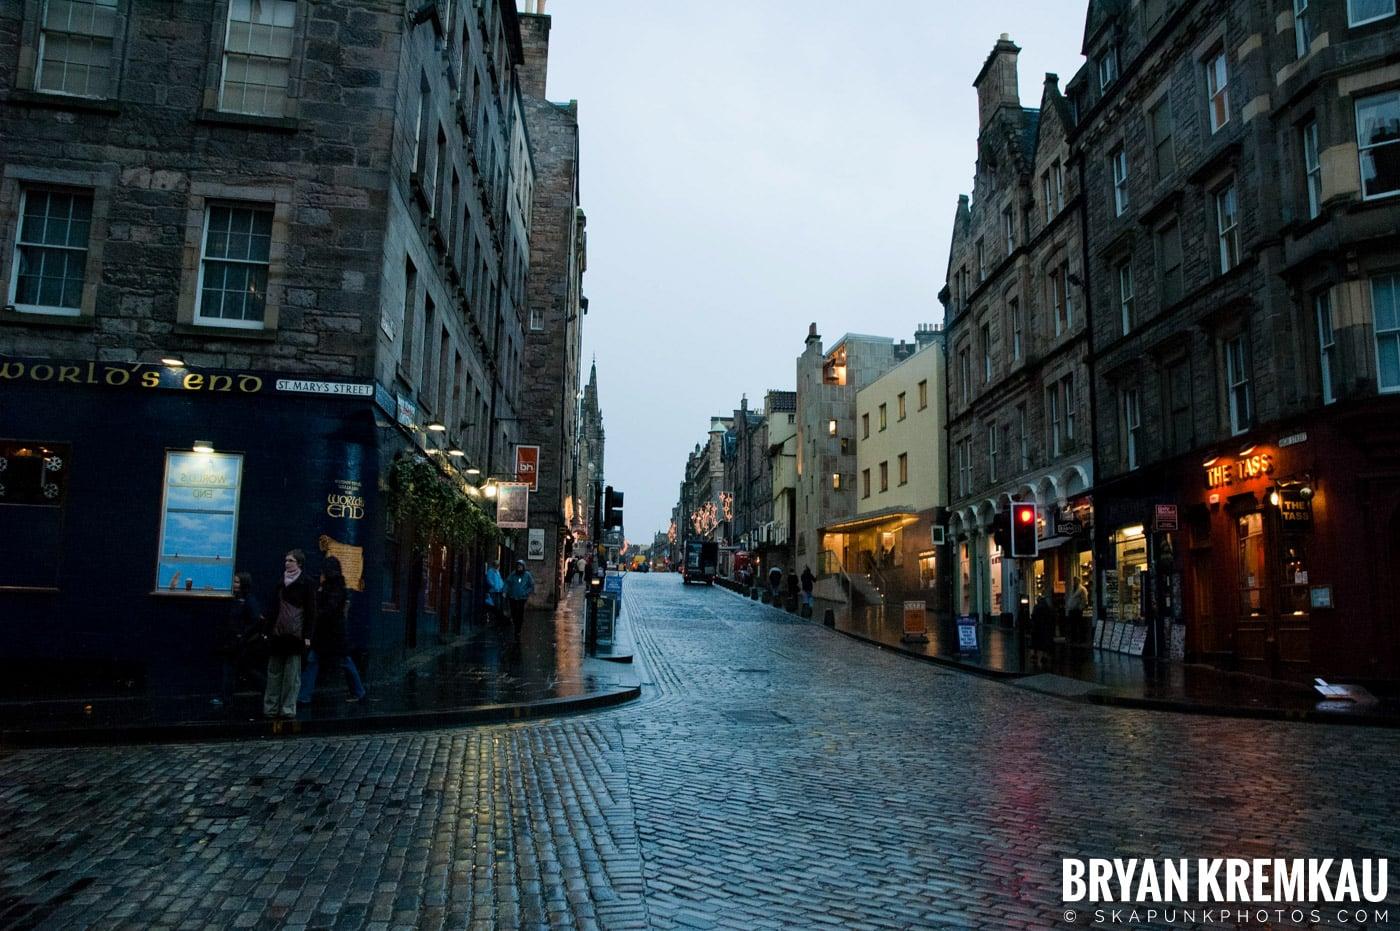 Edinburgh, Scotland - Day 1 - 12.12.06 (2)